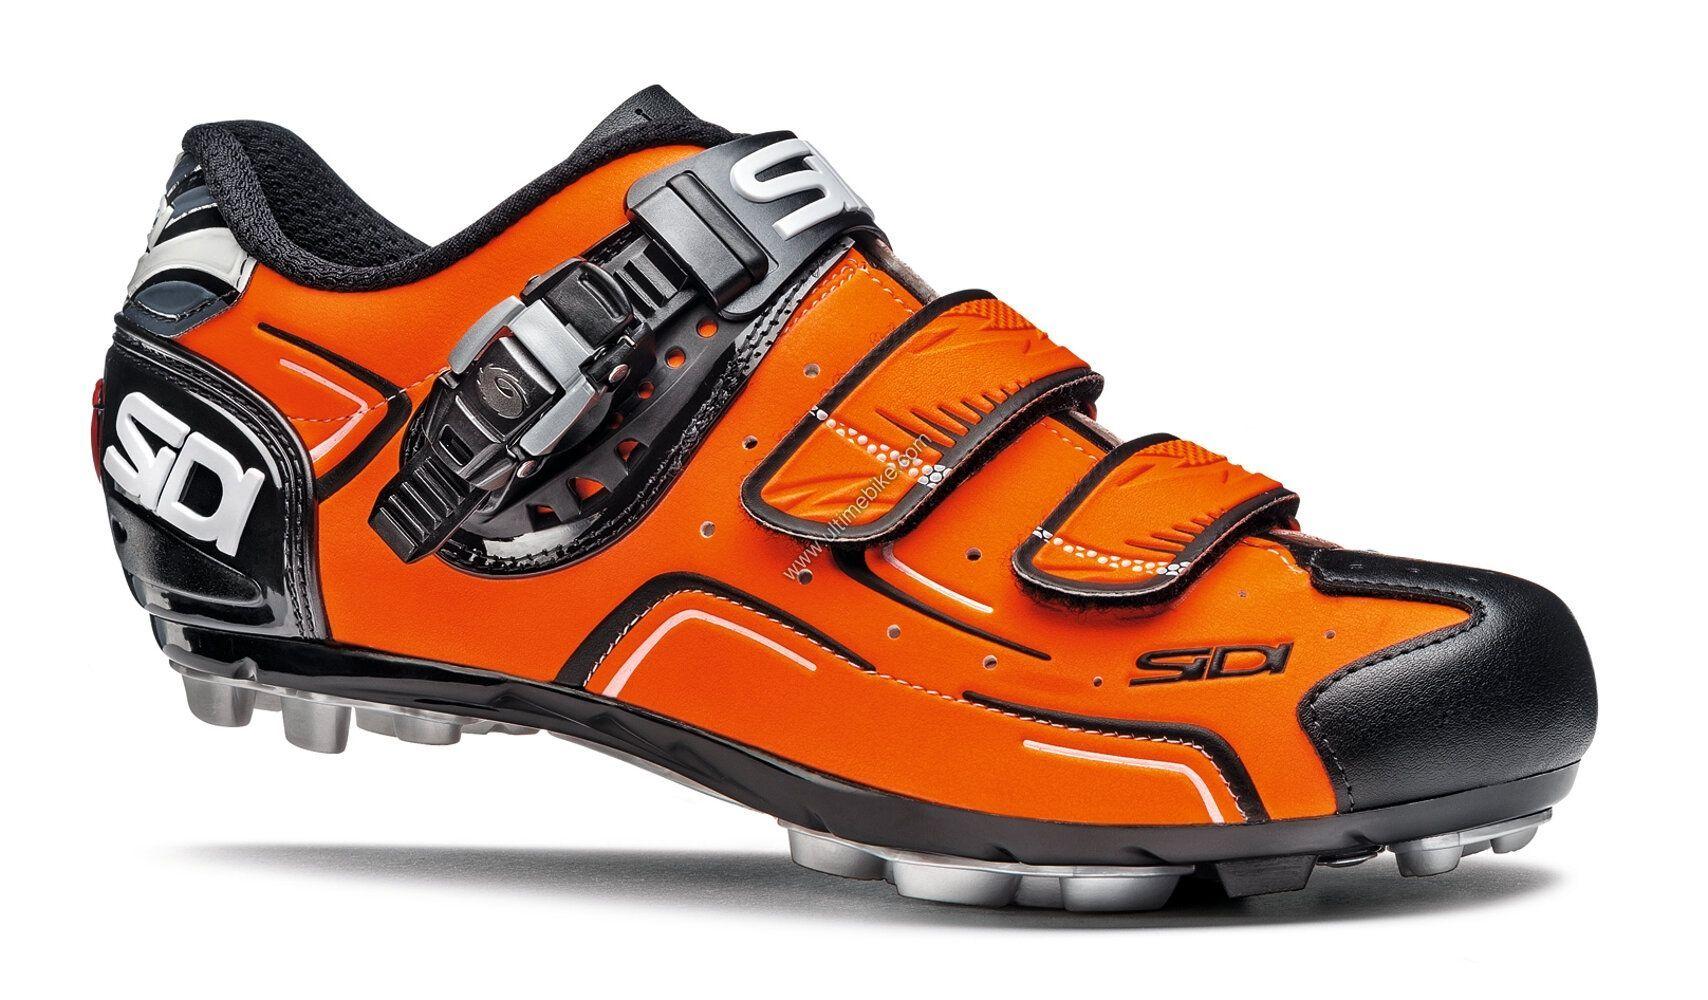 Chaussures Sidi MTB BUVEL Orange fluo/Noir - 38